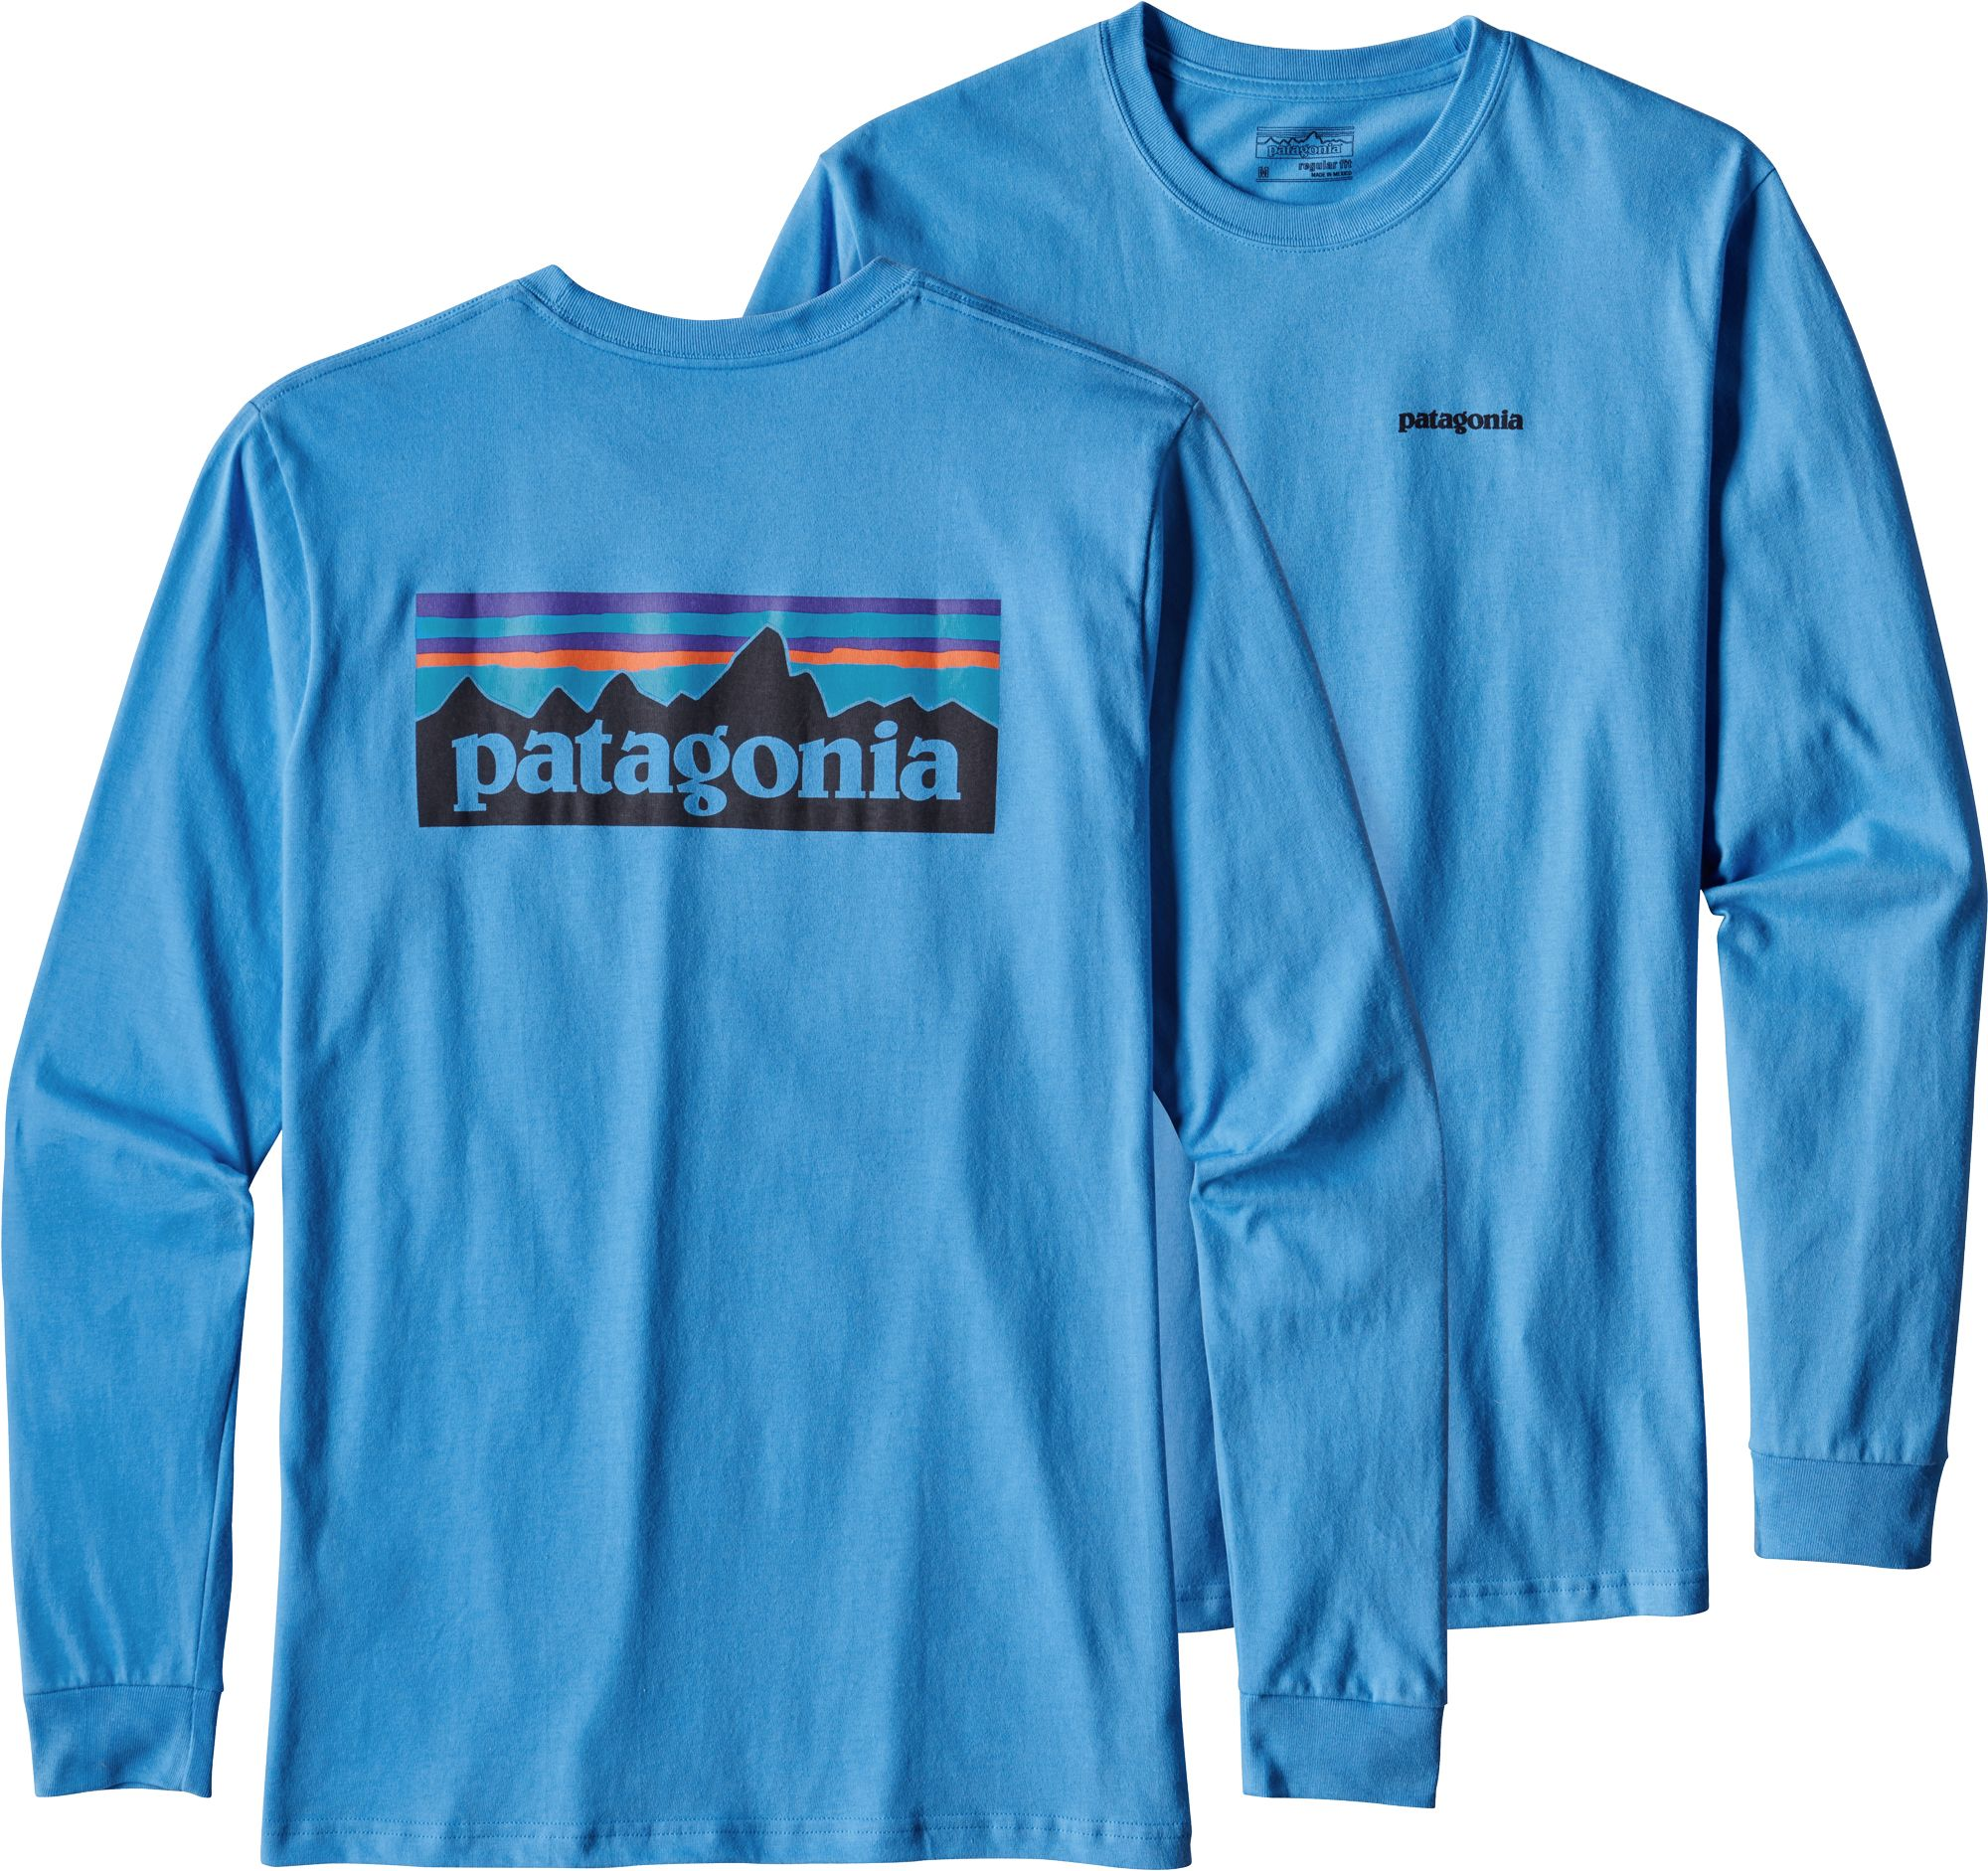 Patagonia Men's P-6 Logo Long Sleeve T-Shirt | DICK'S Sporting Goods